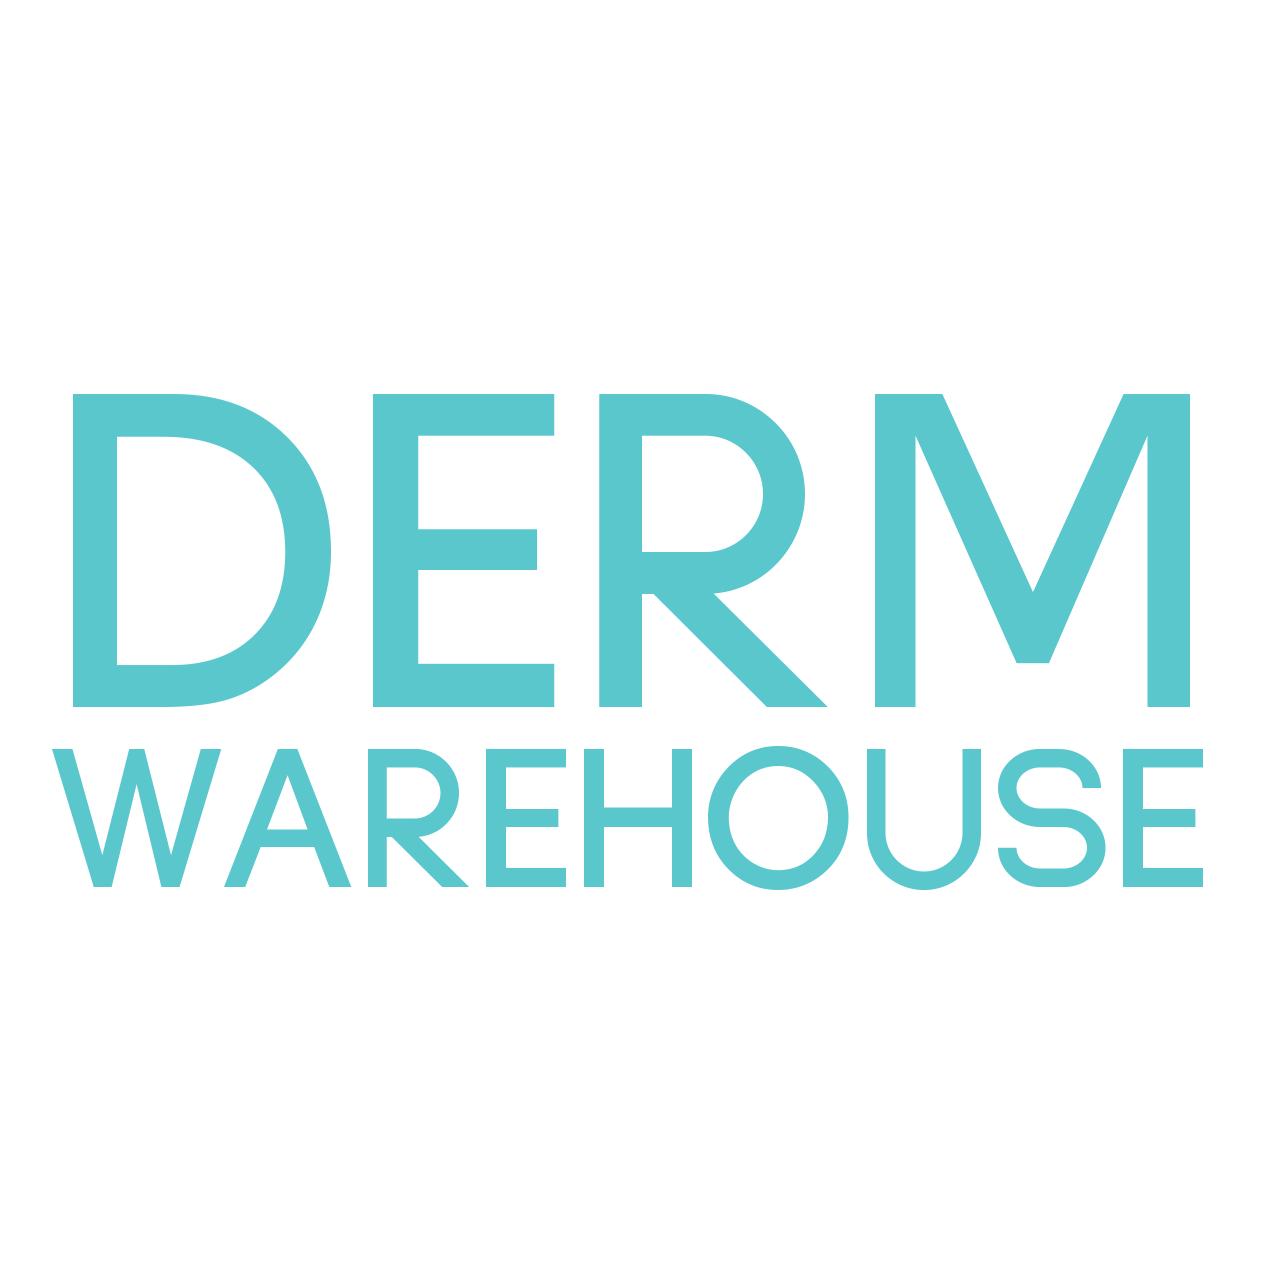 DermWarehouse image 1